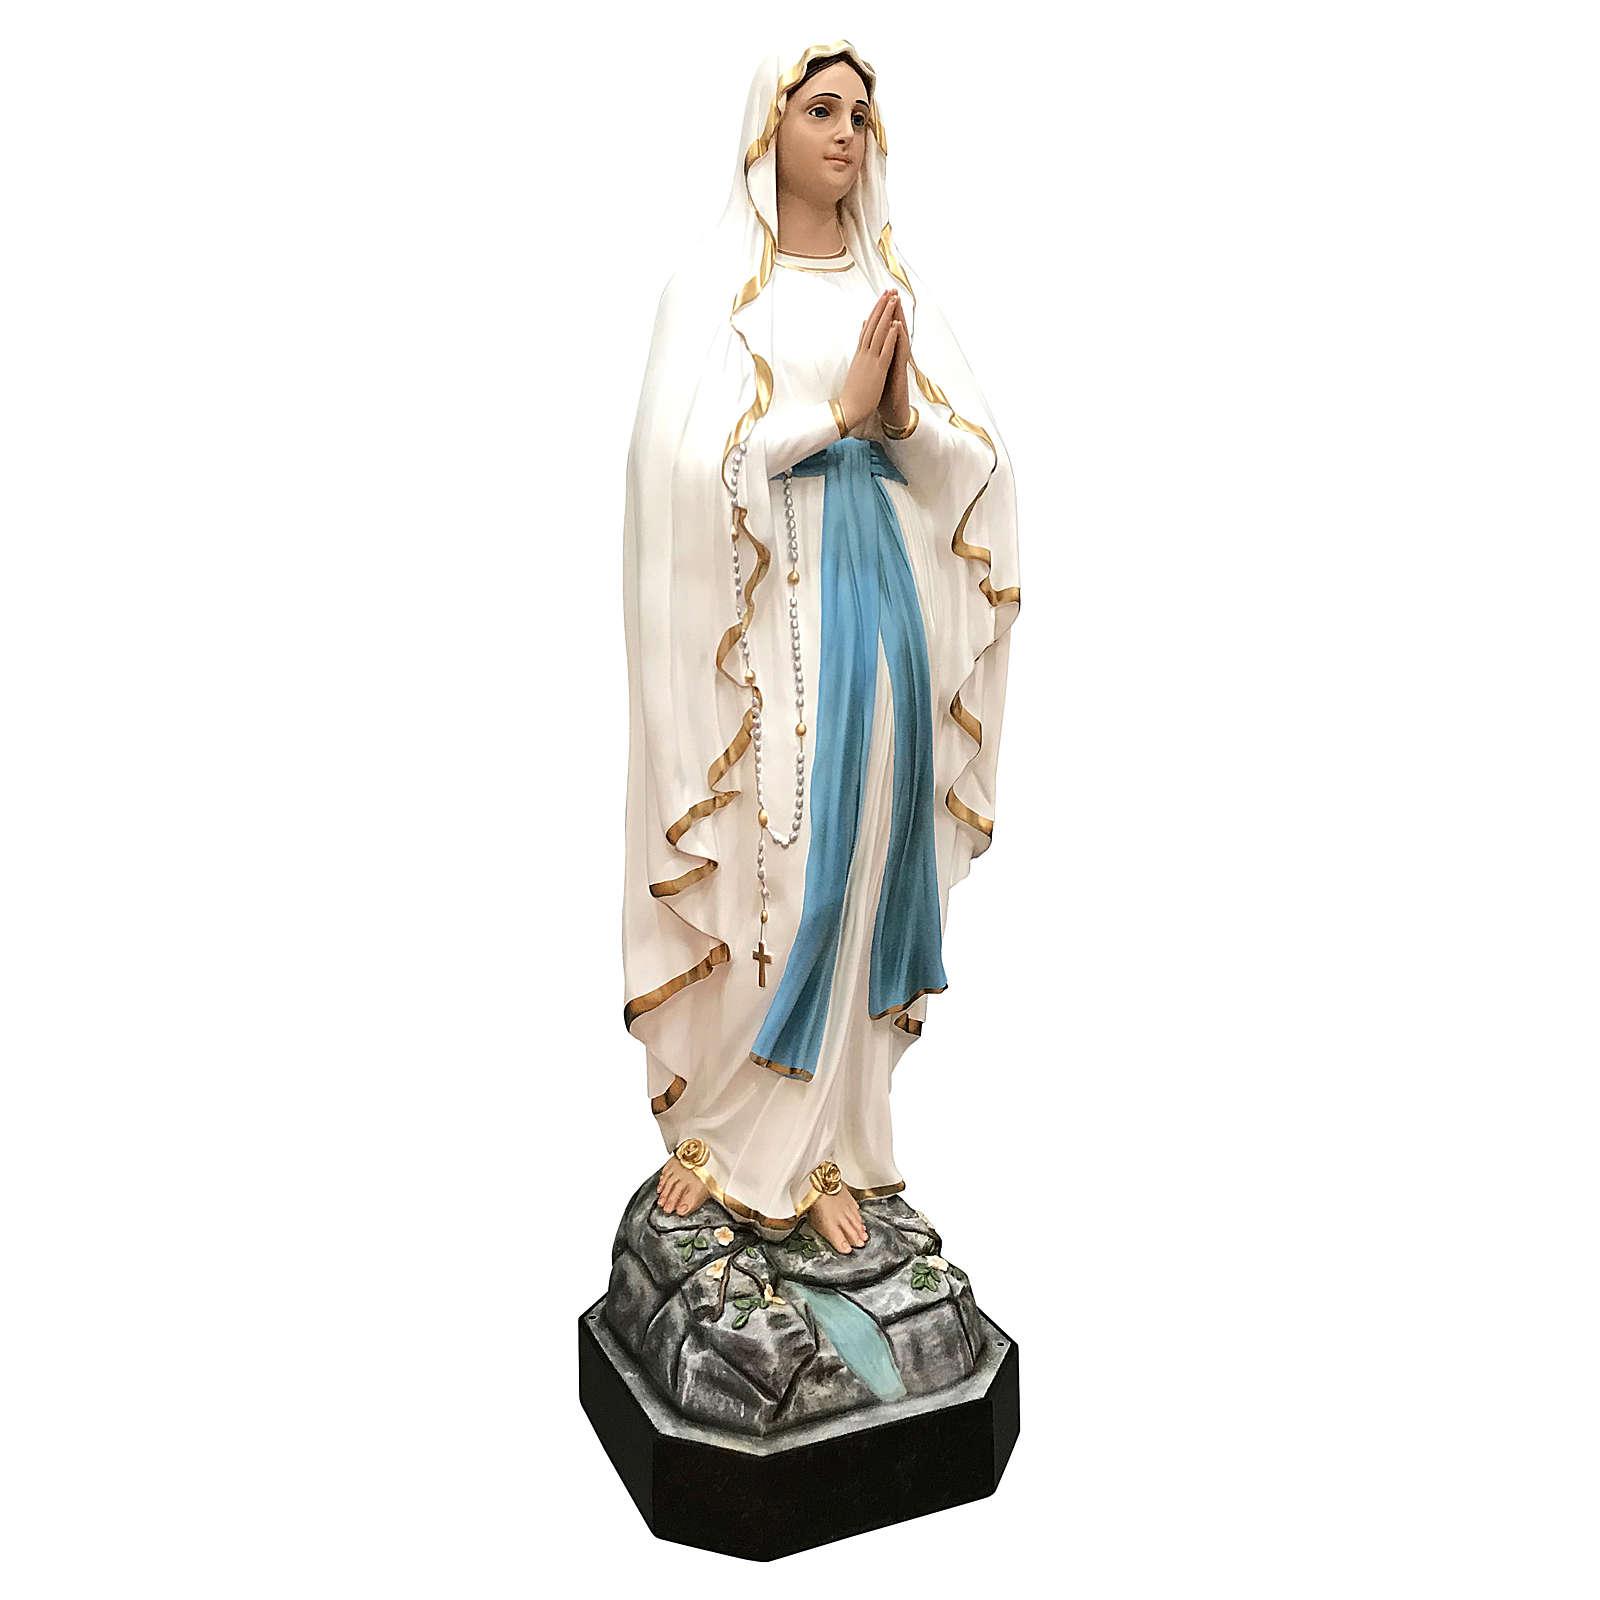 Estatua Virgen de Lourdes fibra de vidrio 130 cm pintada ojos de cristal 4